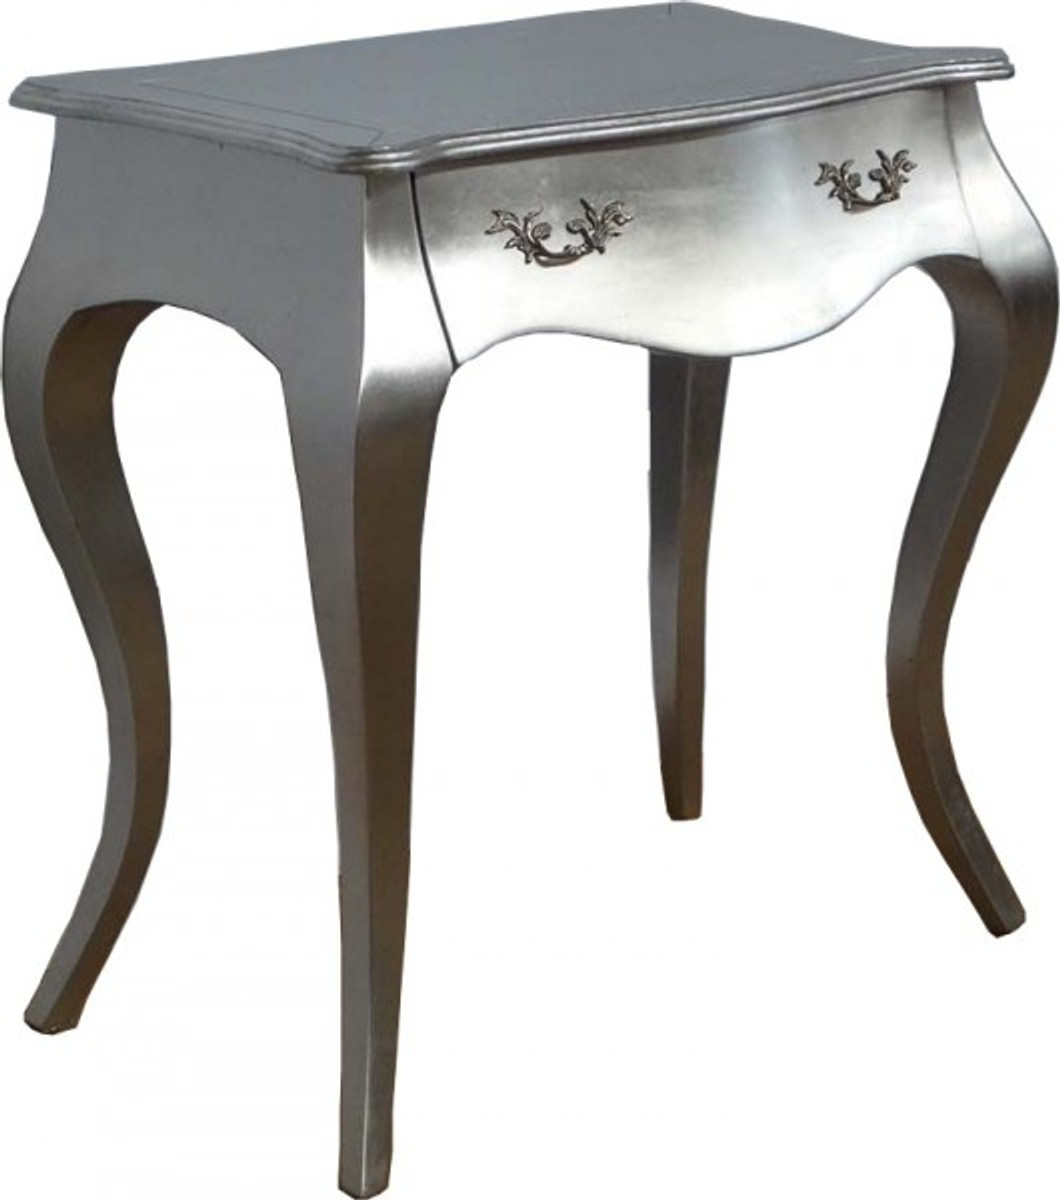 konsolentisch silber bestseller shop f r m bel und. Black Bedroom Furniture Sets. Home Design Ideas